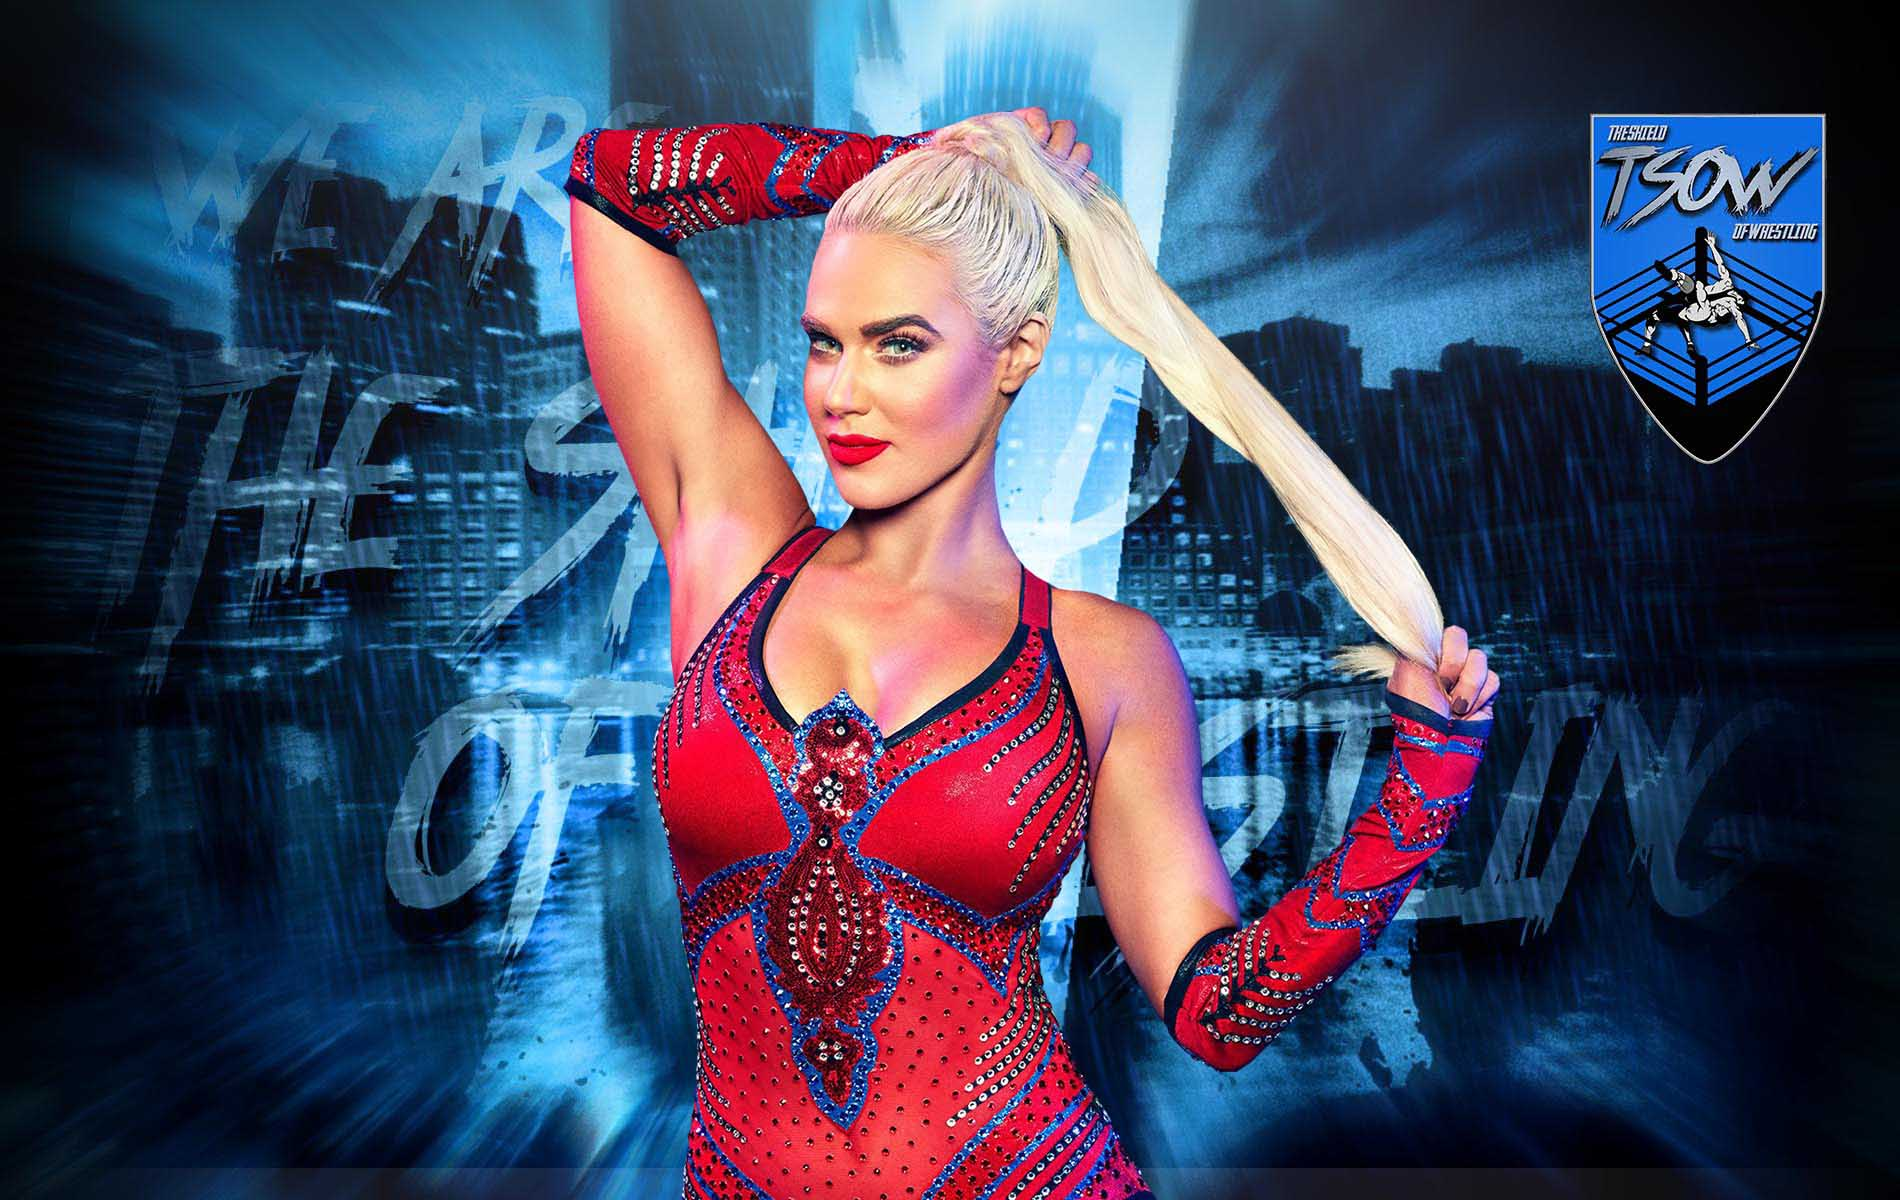 Lana rilasciata dalla WWE